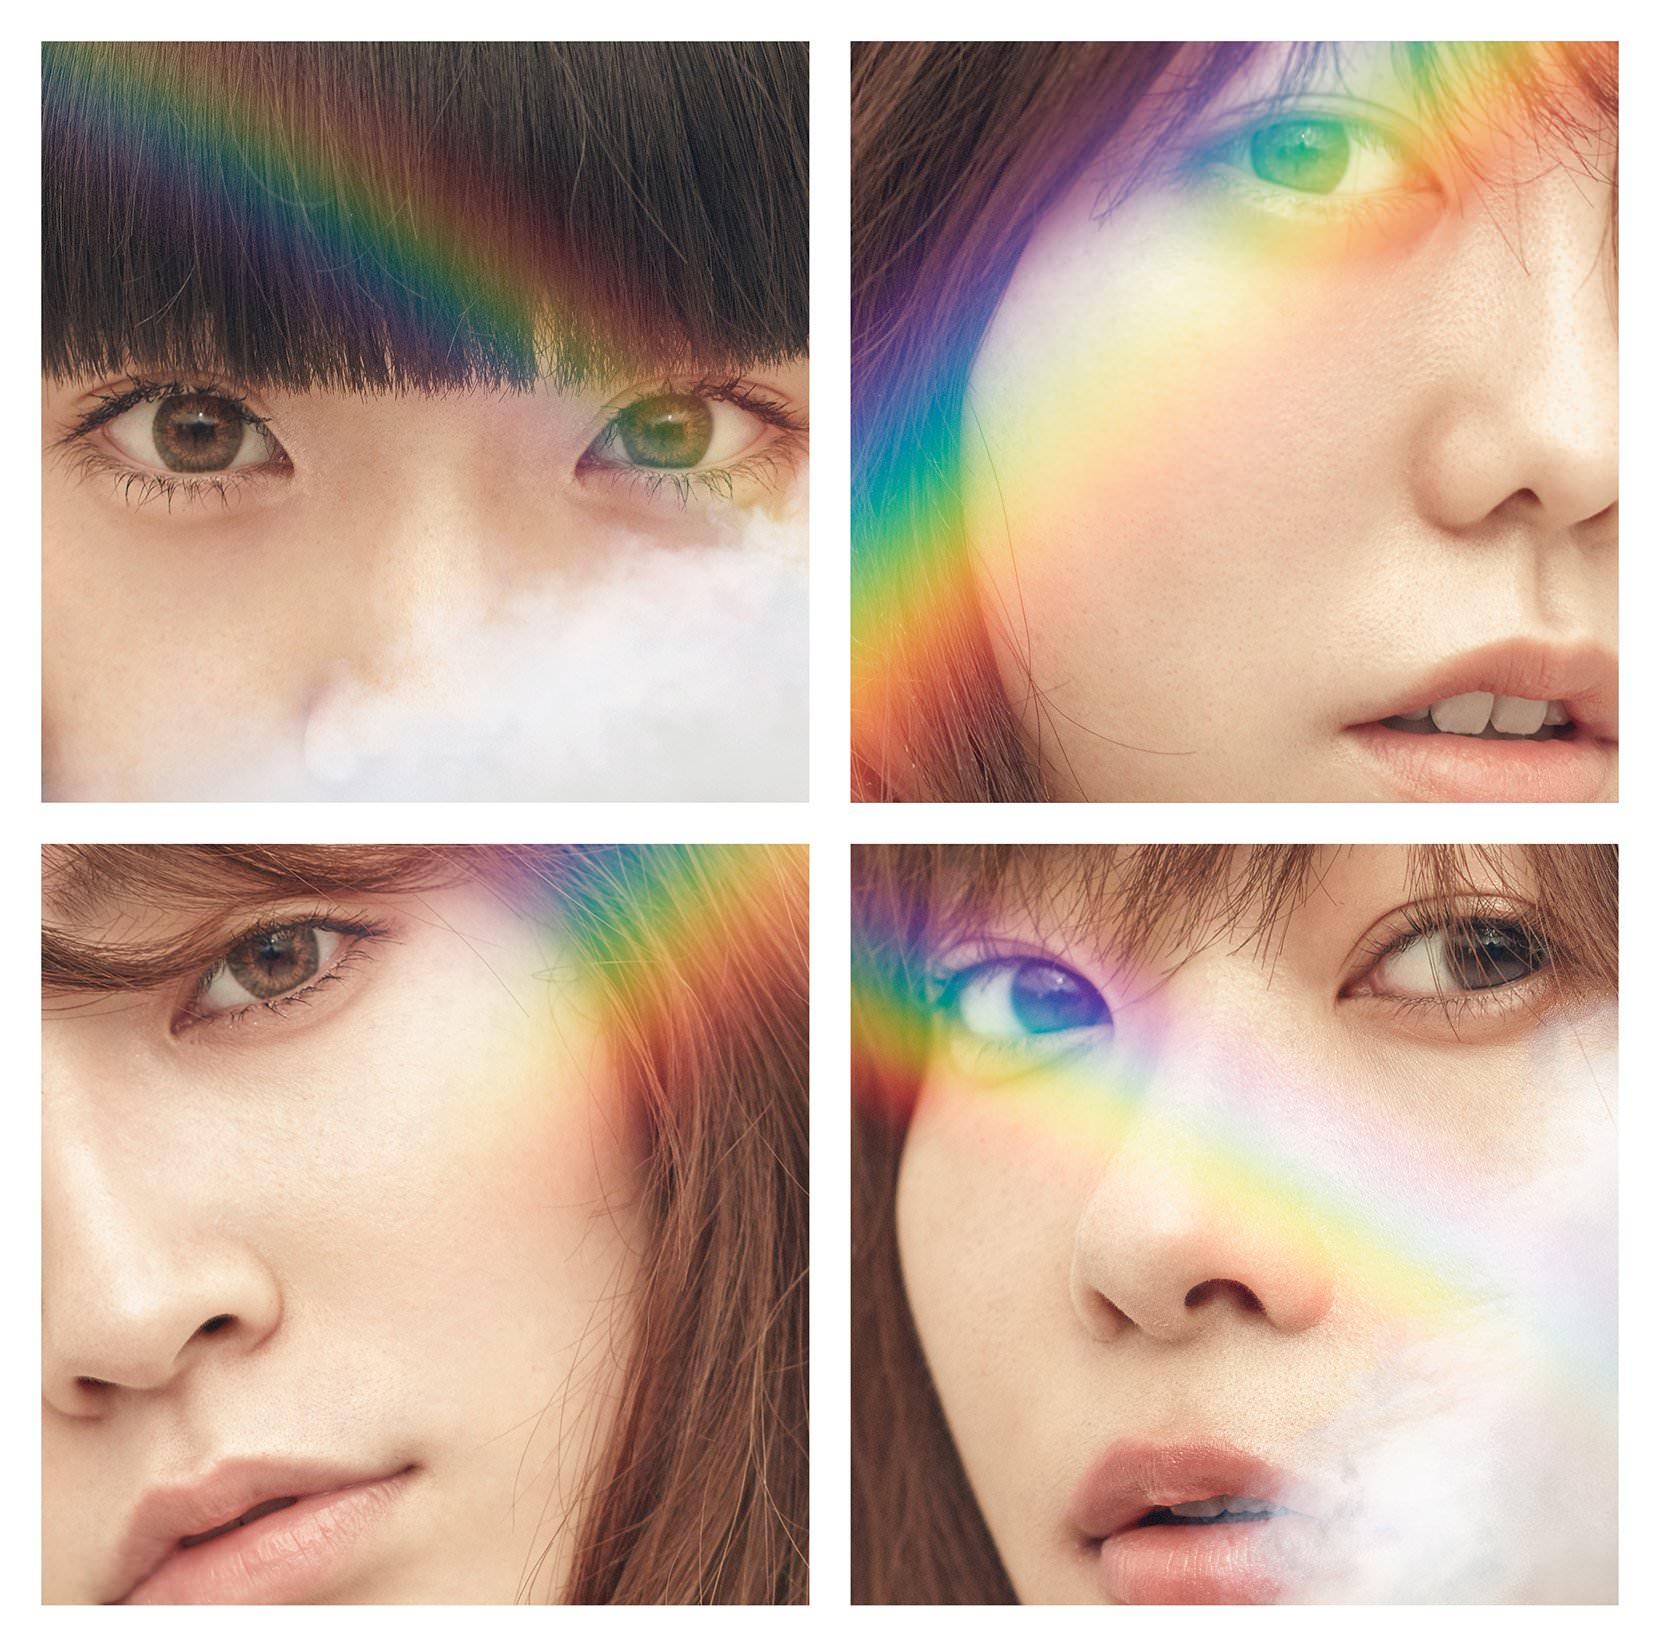 20180810.0048.08 AKB48 - 11gatsu no Anklet (Type C) (DVD) (JPOP.ru) cover 06.jpg